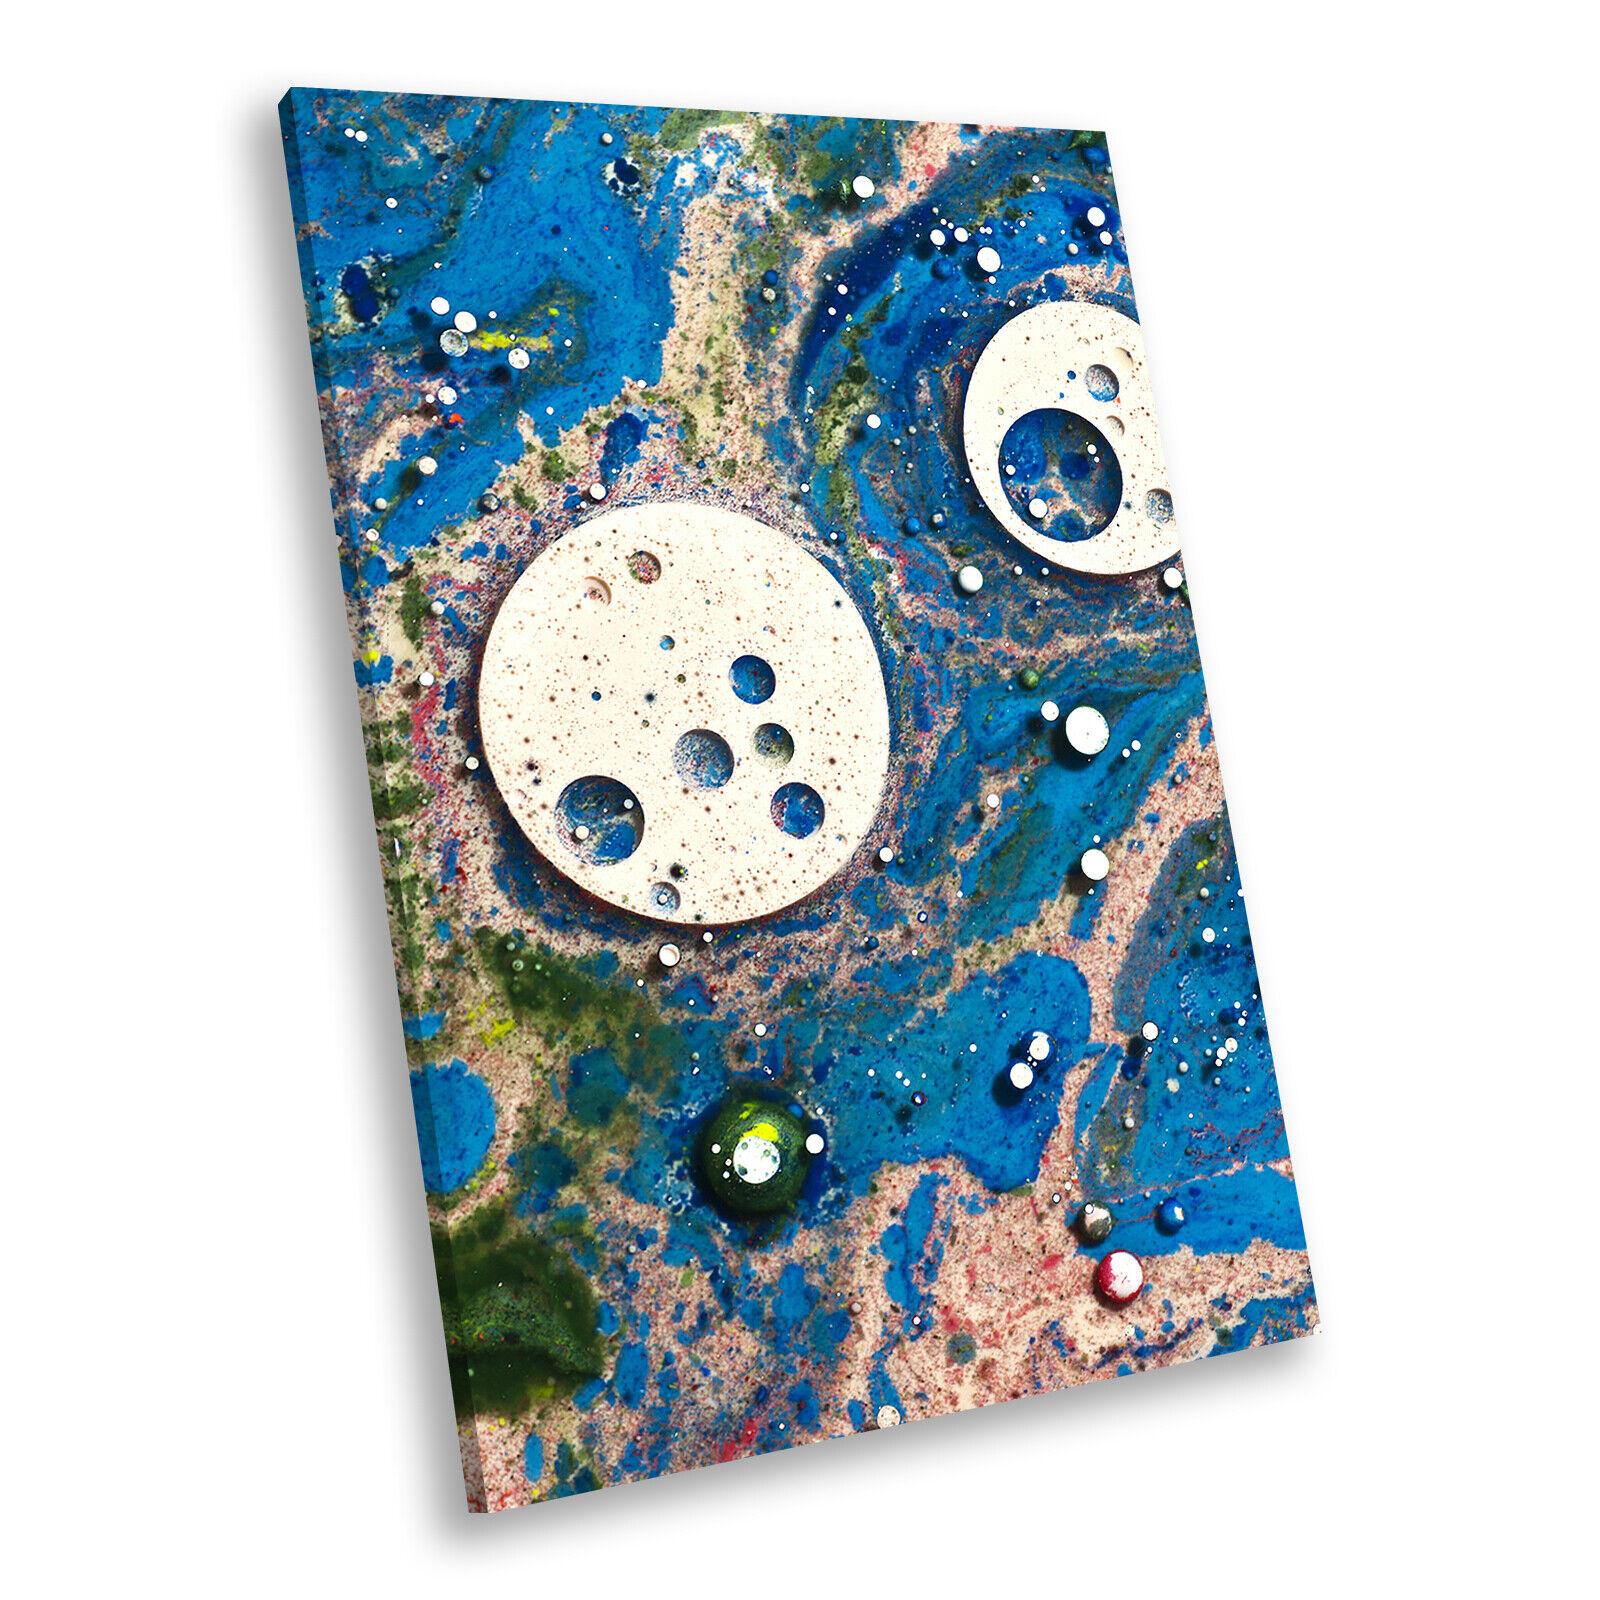 Blau Weiß braun Portrait Abstract Canvas Framed Art Large Picture